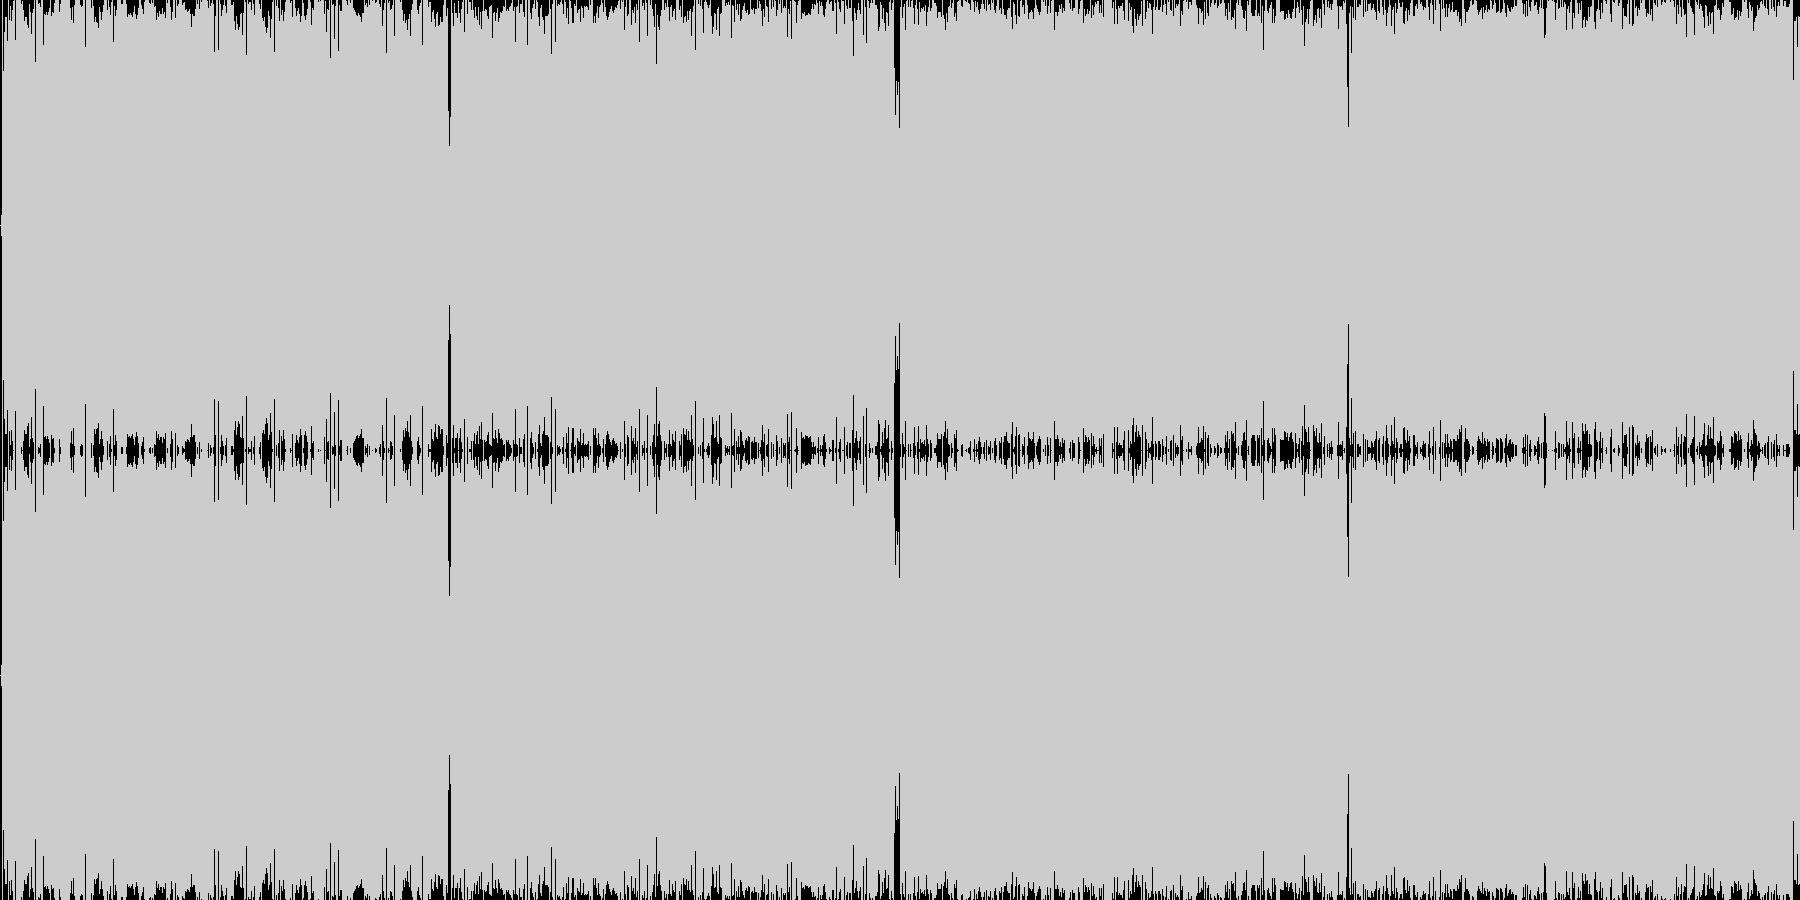 8bit音のみで作ったシンプルピコピコ…の未再生の波形